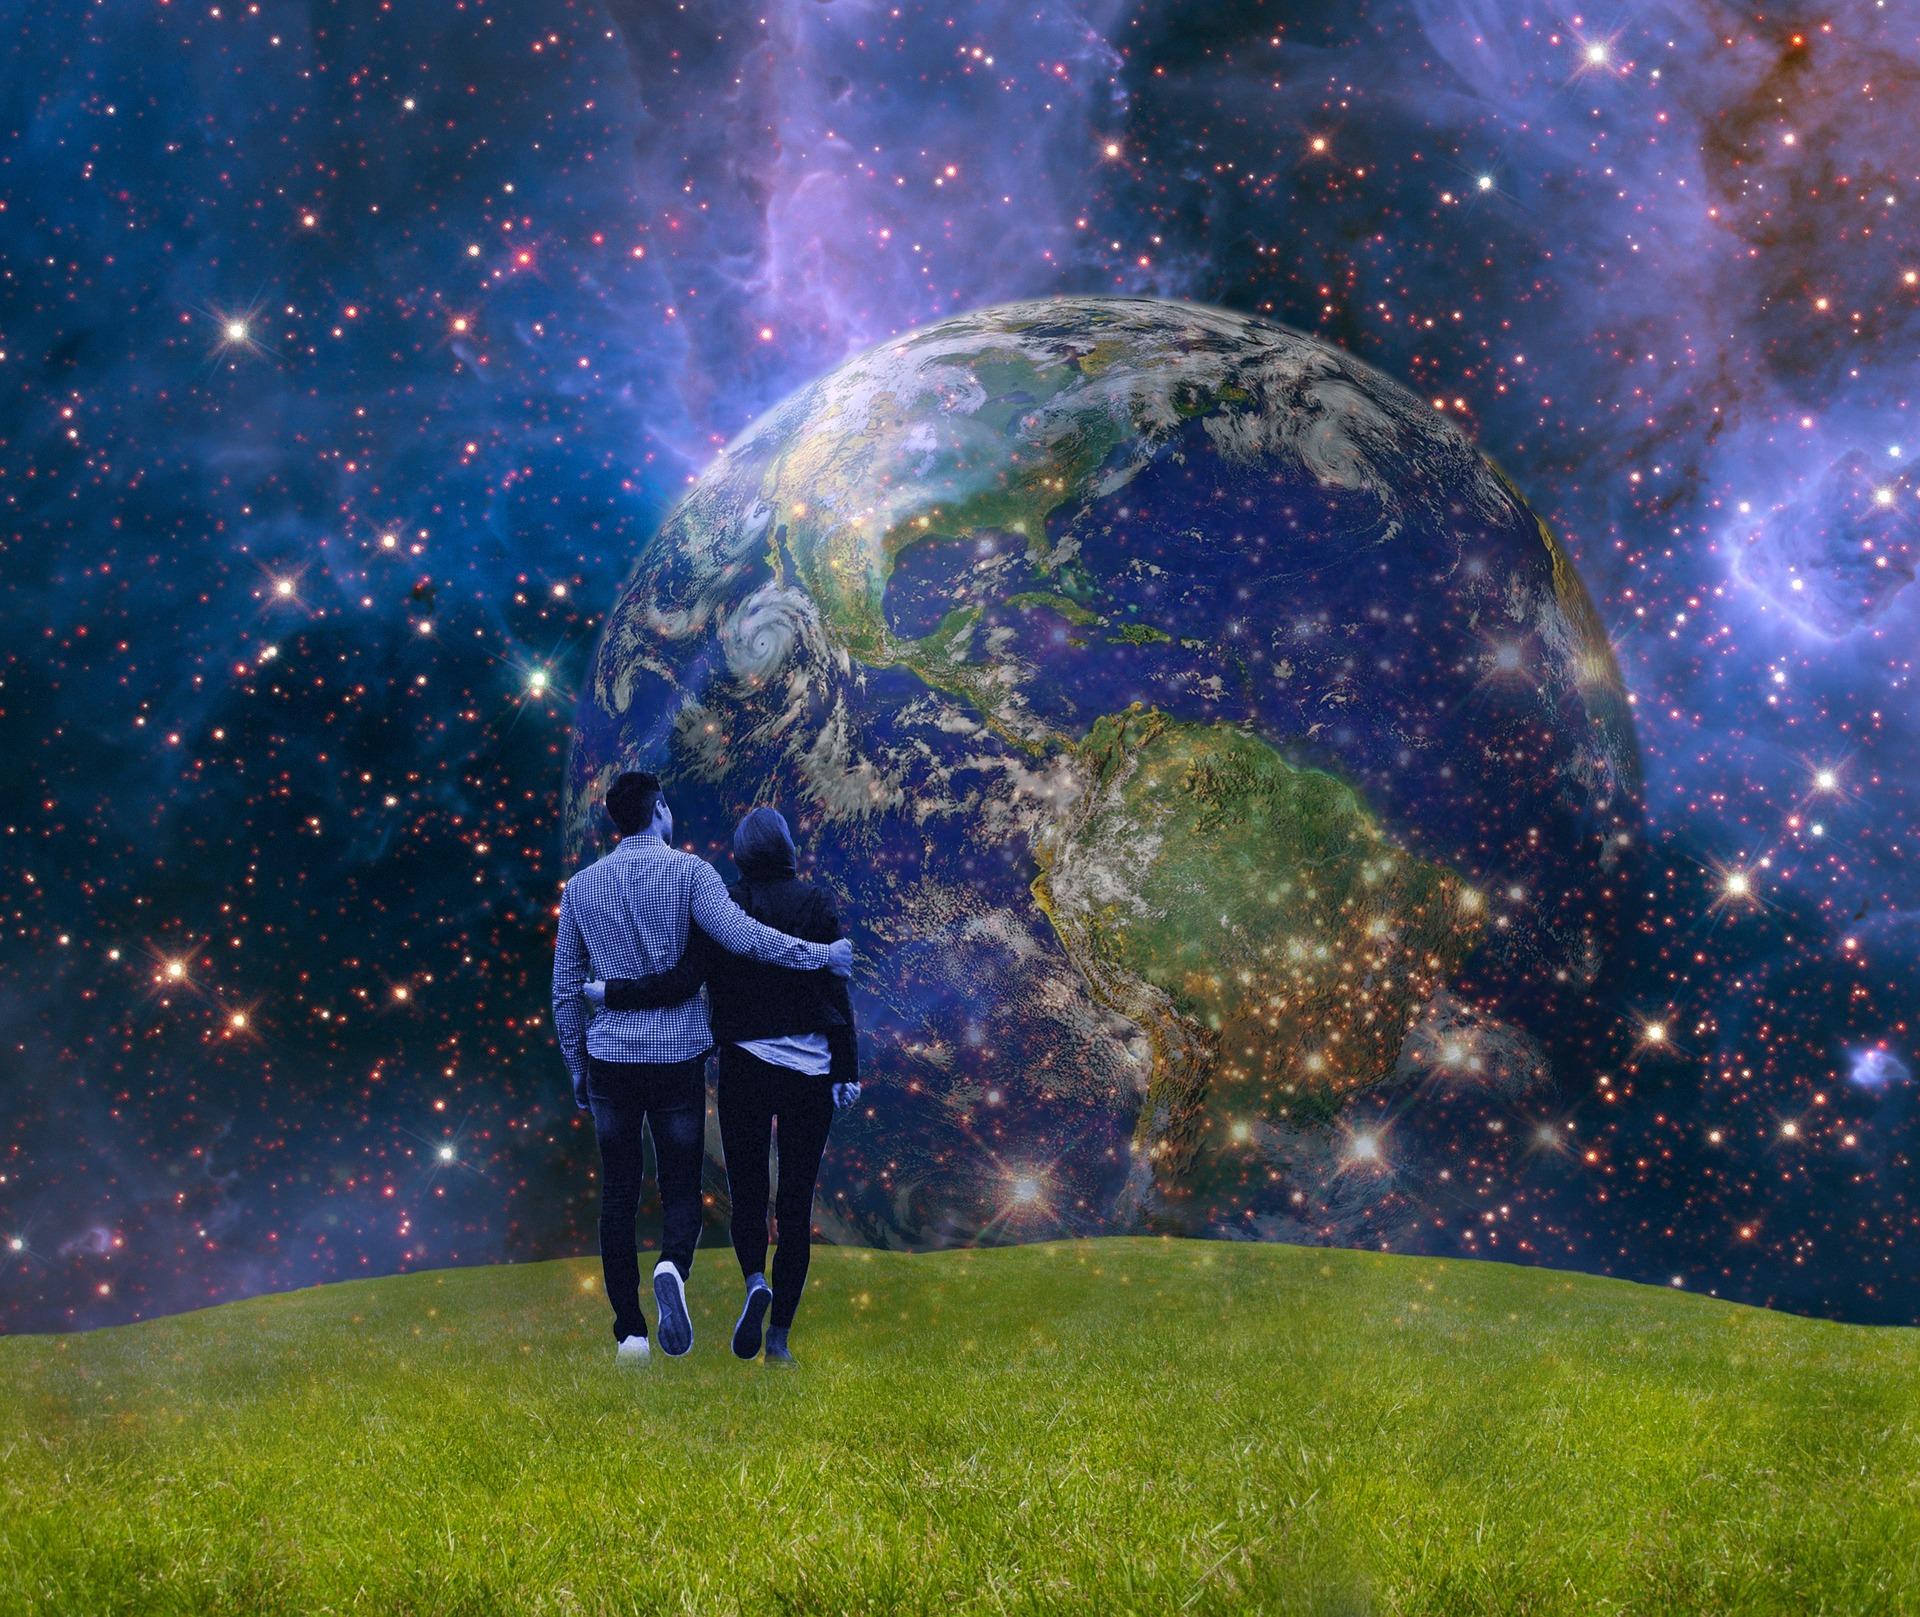 horoscopul verii 2019 - sfatulparinitlor.ro - pixabay_com - earth-2841056_1920